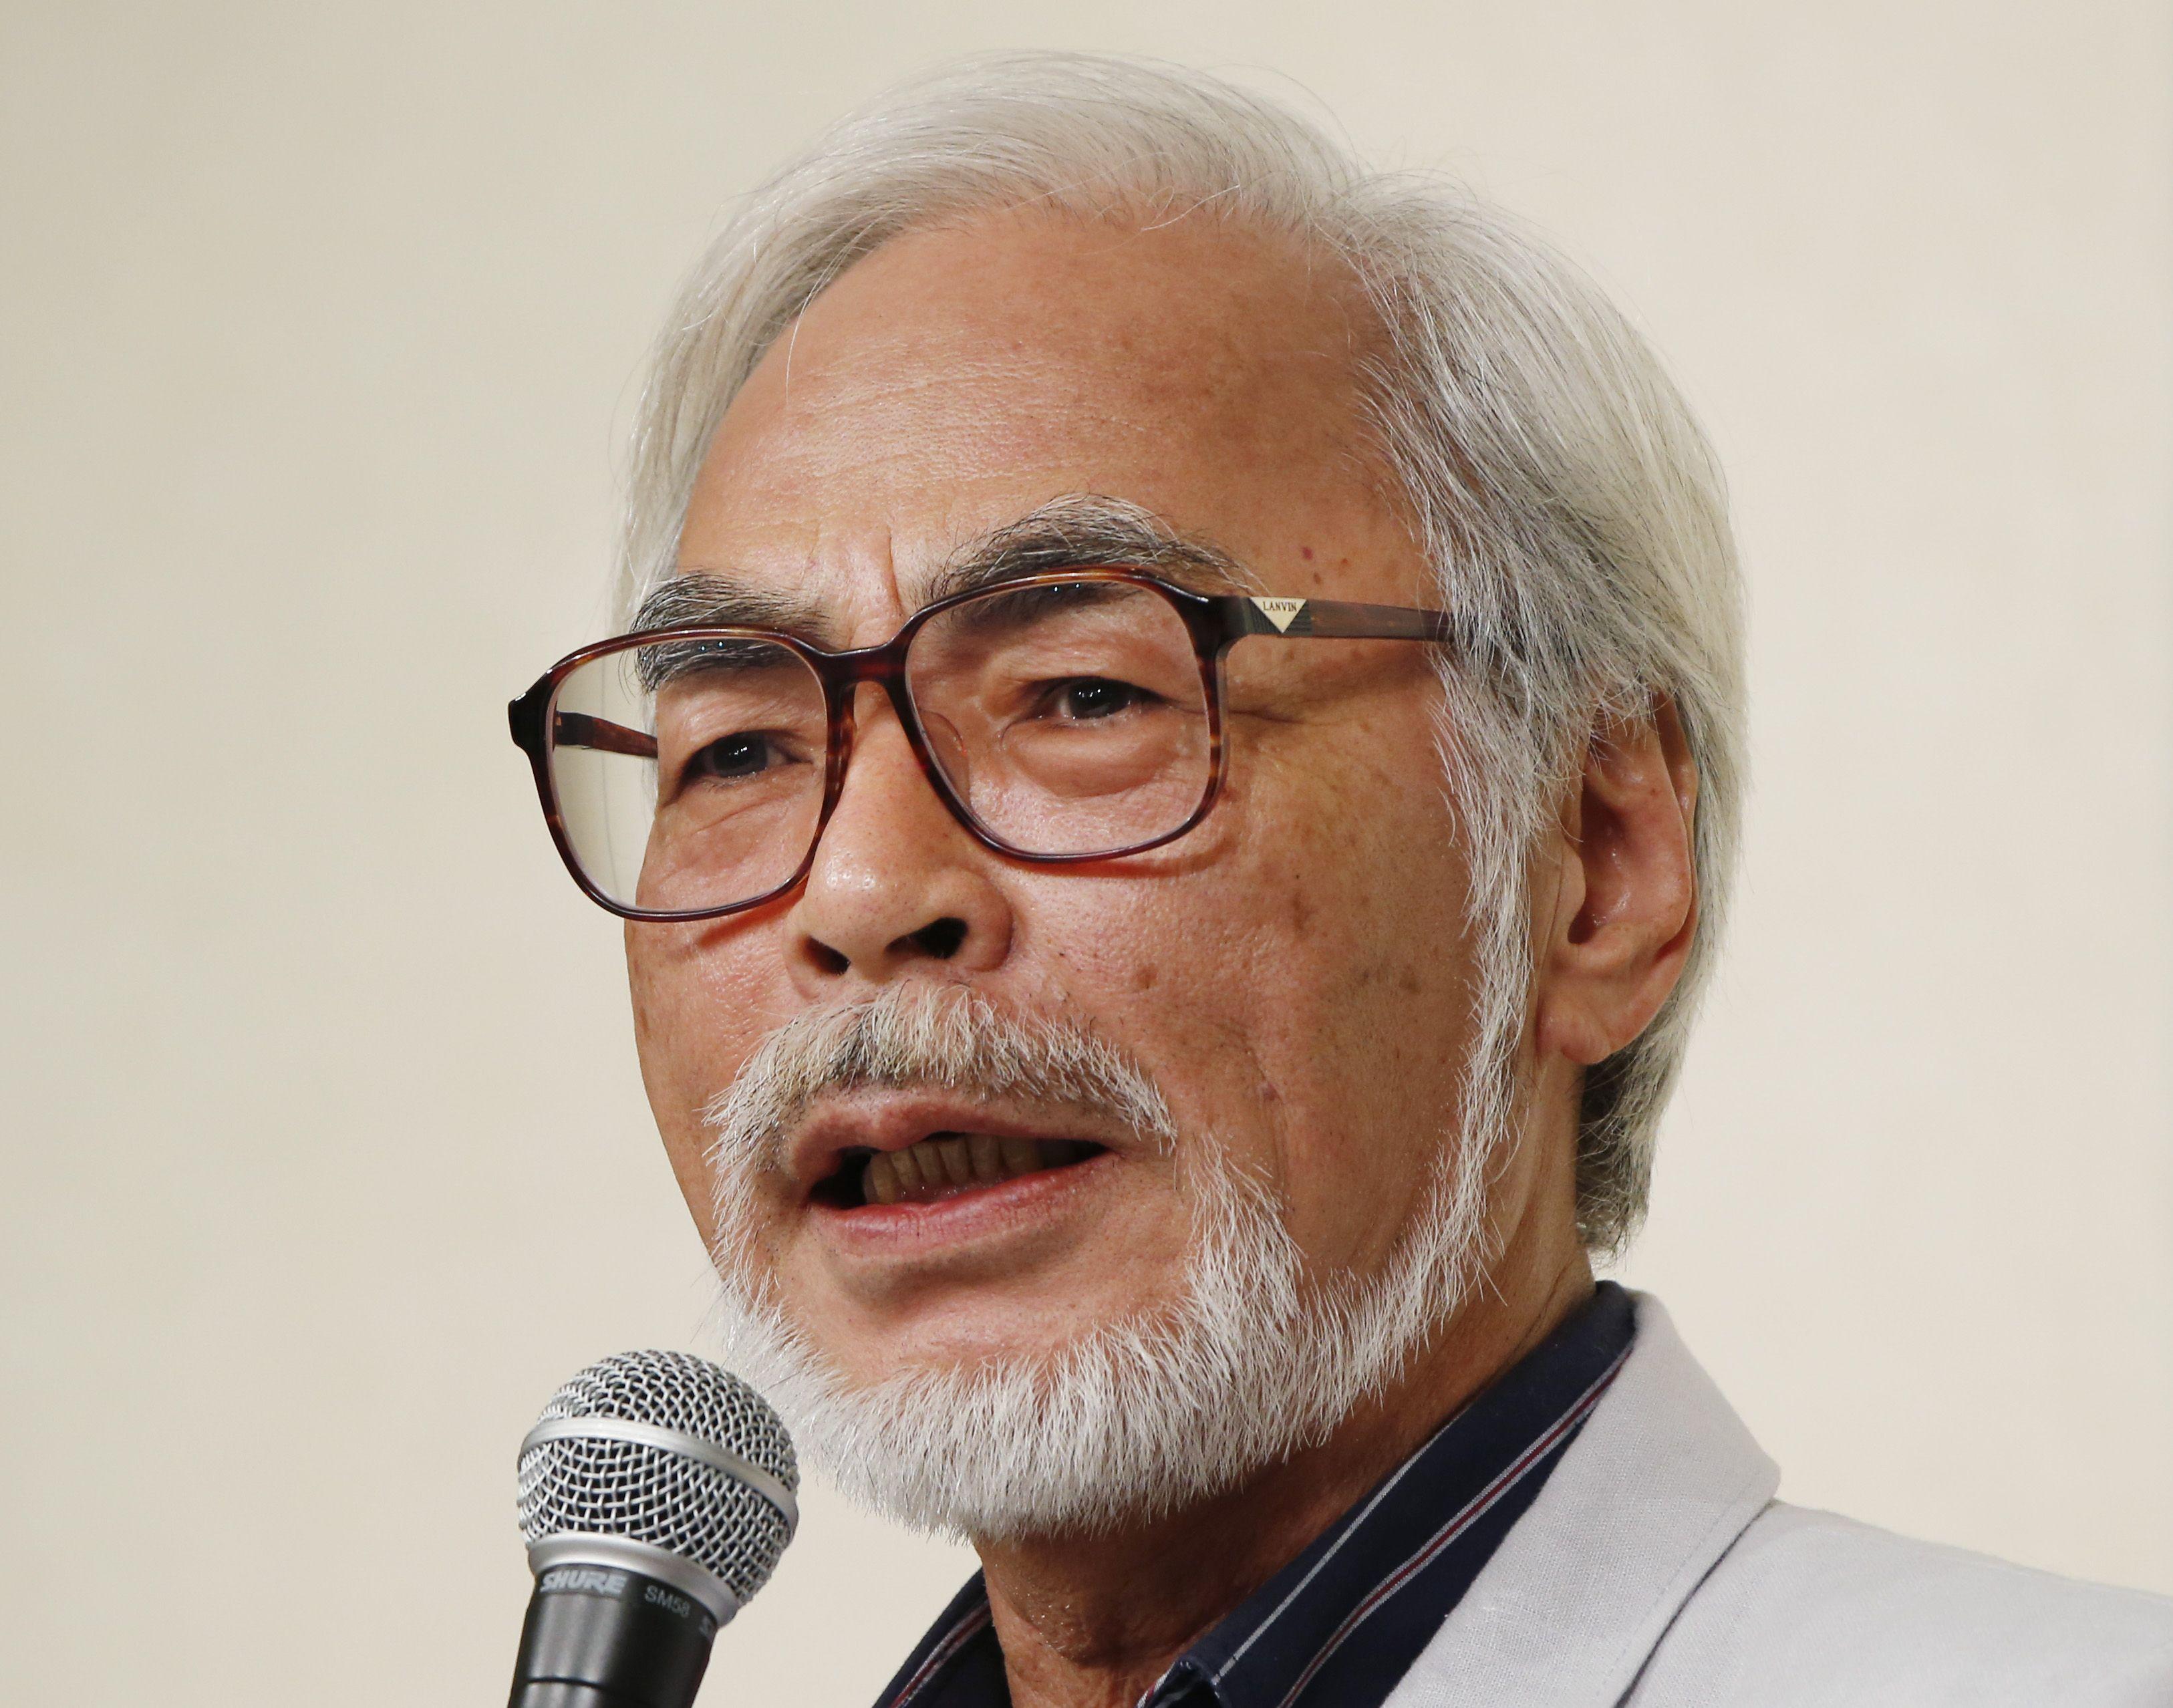 Hayao Miyazaki Calls A I  Animation 'An Insult To Life Itself